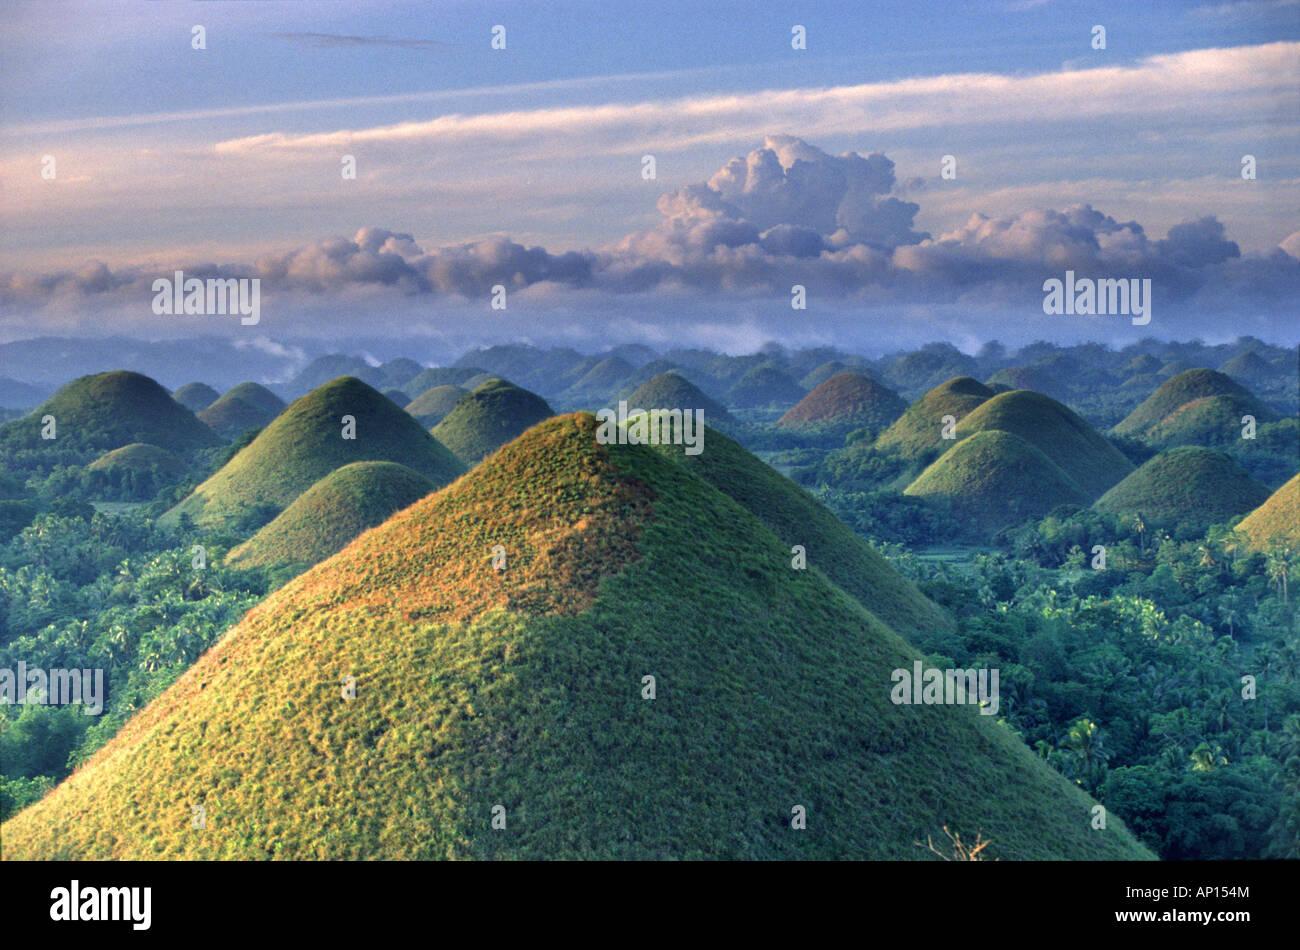 Sunrise, Chocolate Hills, natural wonder, Bohol Island, Philippines - Stock Image